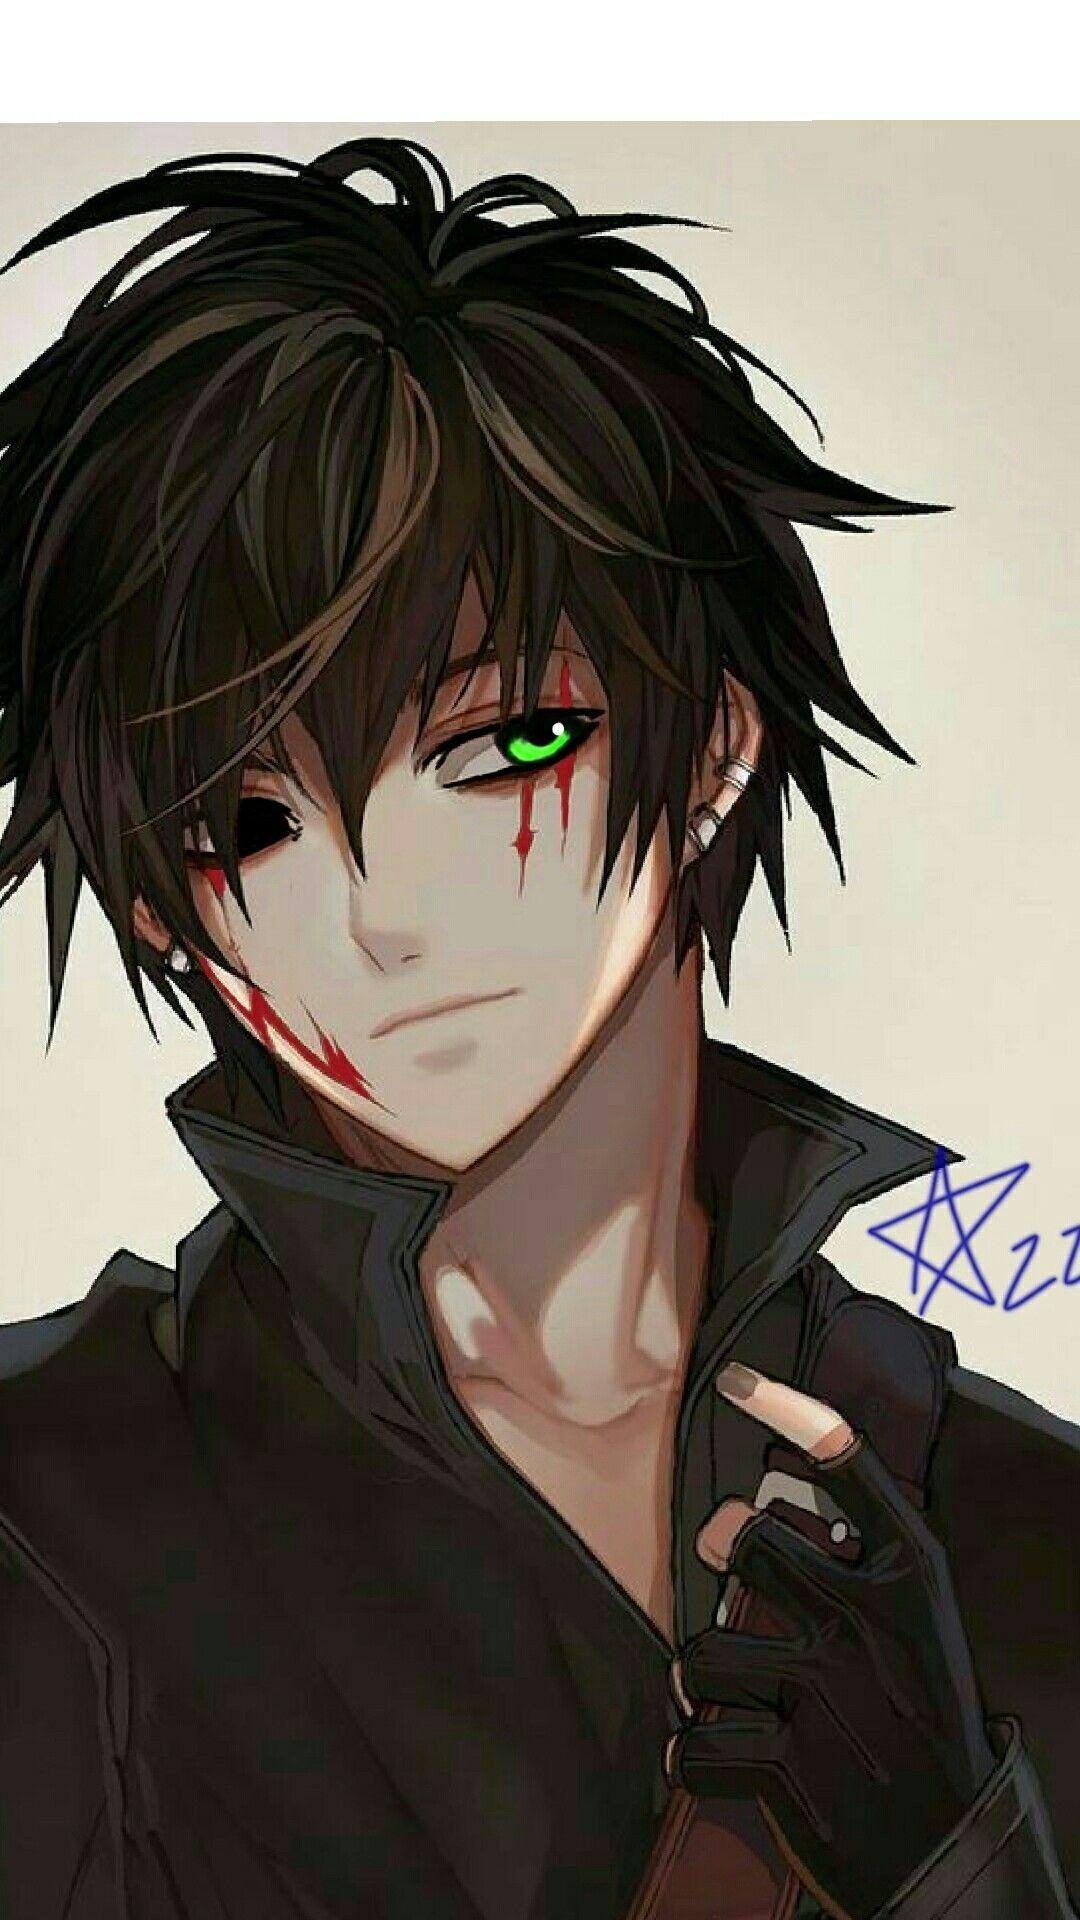 Anime drawings boy image by Elijah Corbin on anime | Cute ...